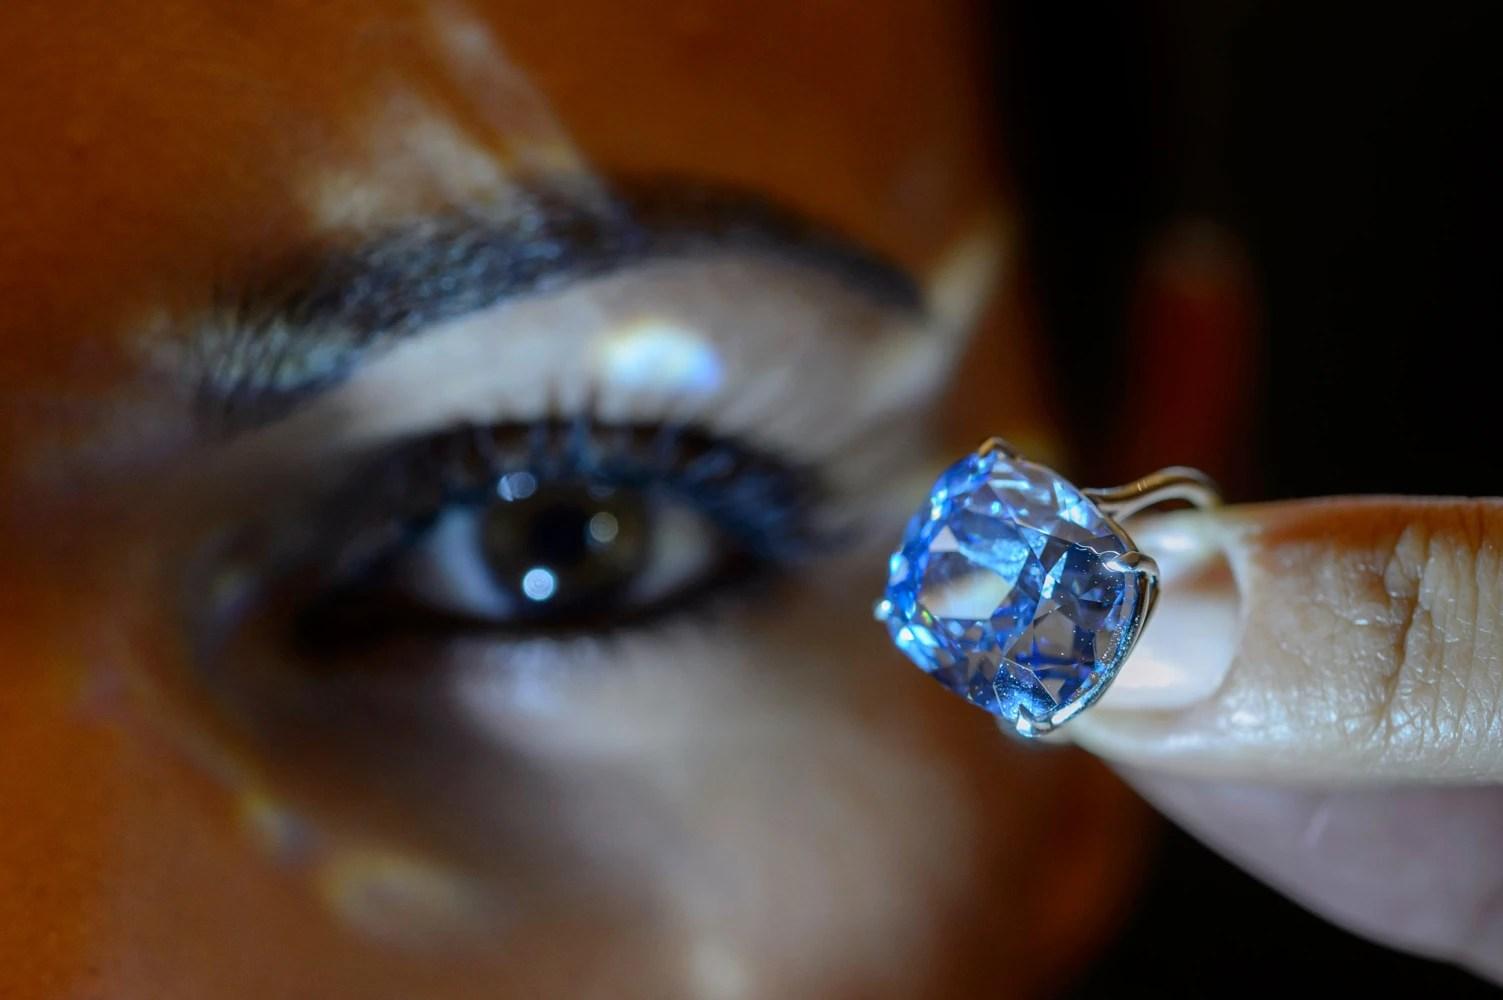 Rare Blue Diamond Sells For Record $485 Million At